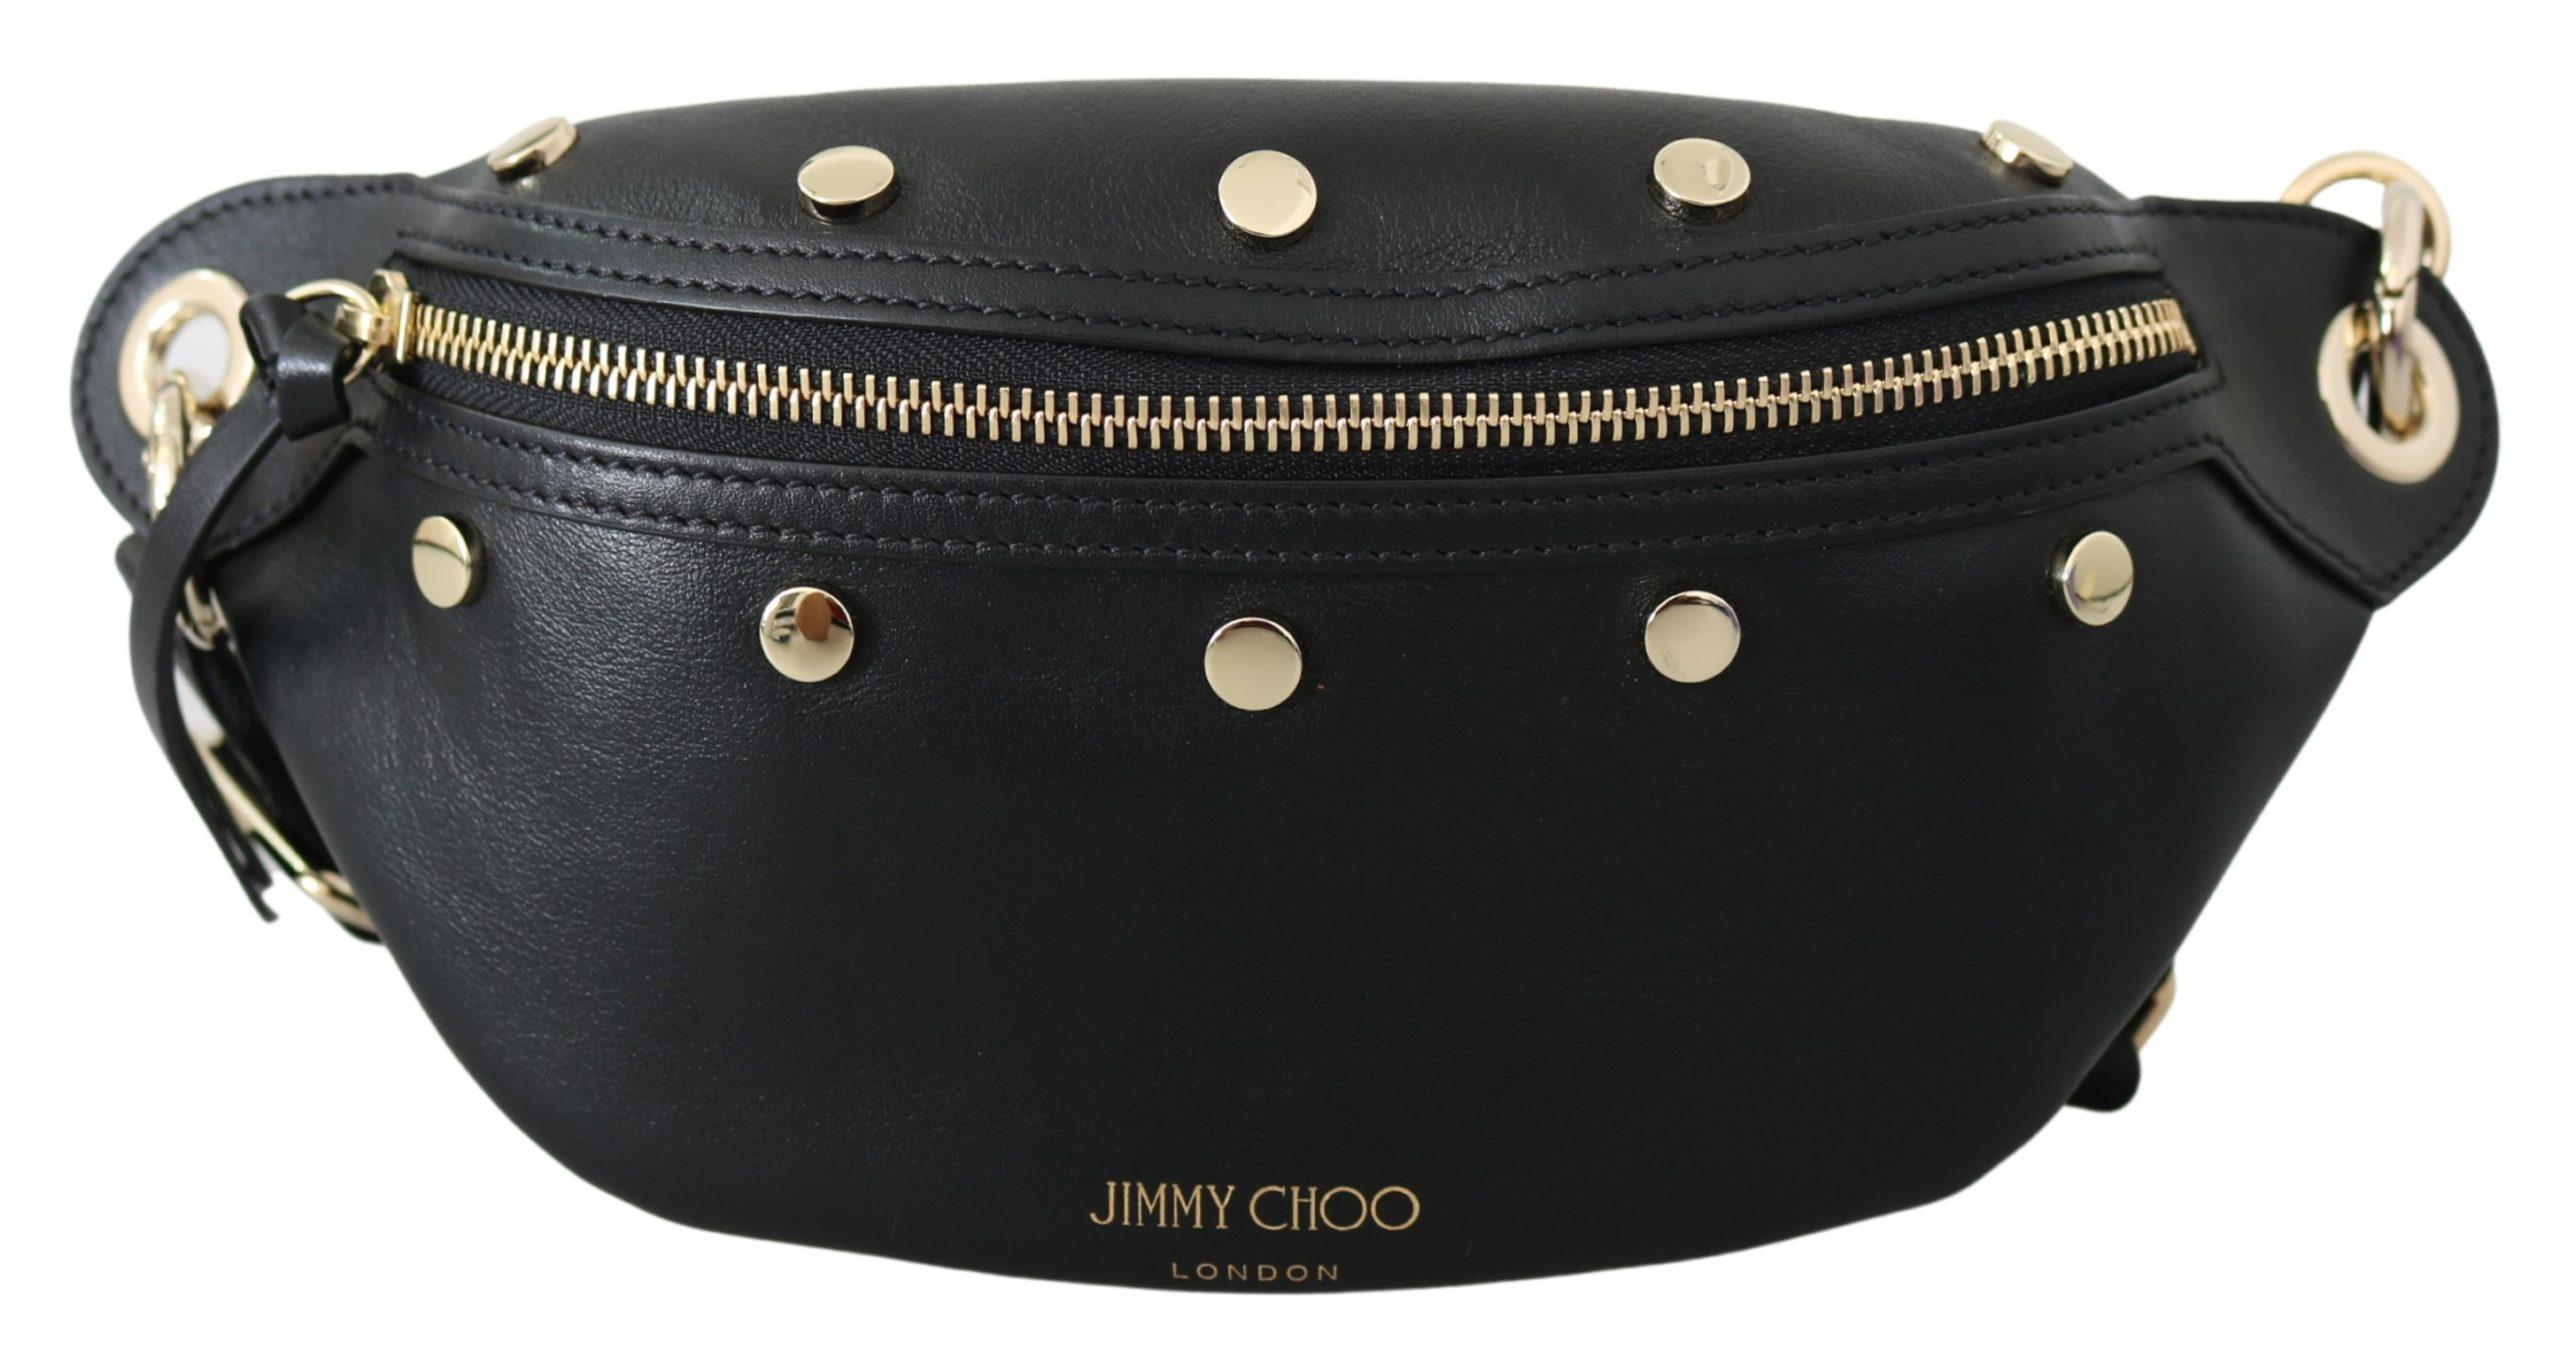 Jimmy Choo Women's Lockett Belt Bag Black 1436310